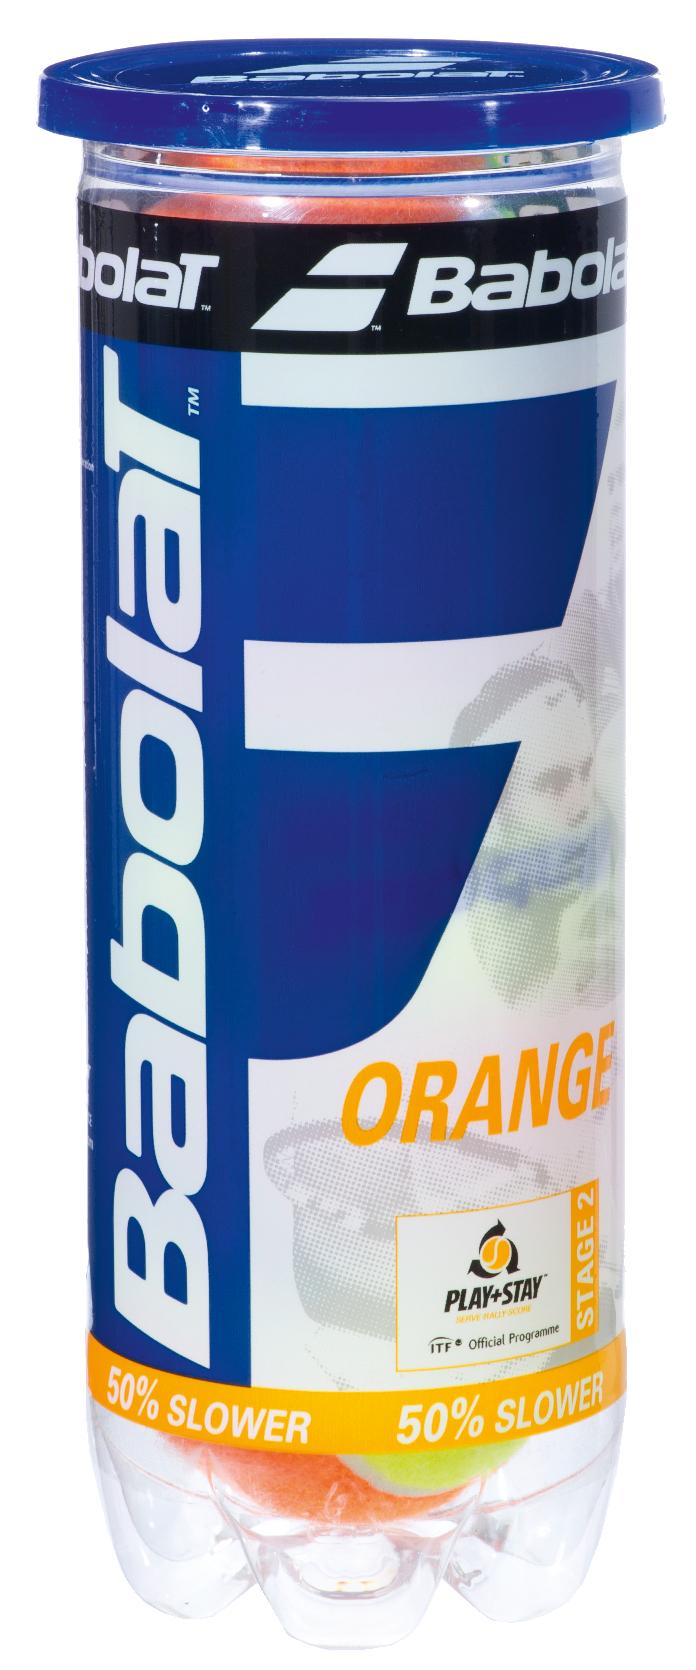 Oranje (3 ballen/tube)